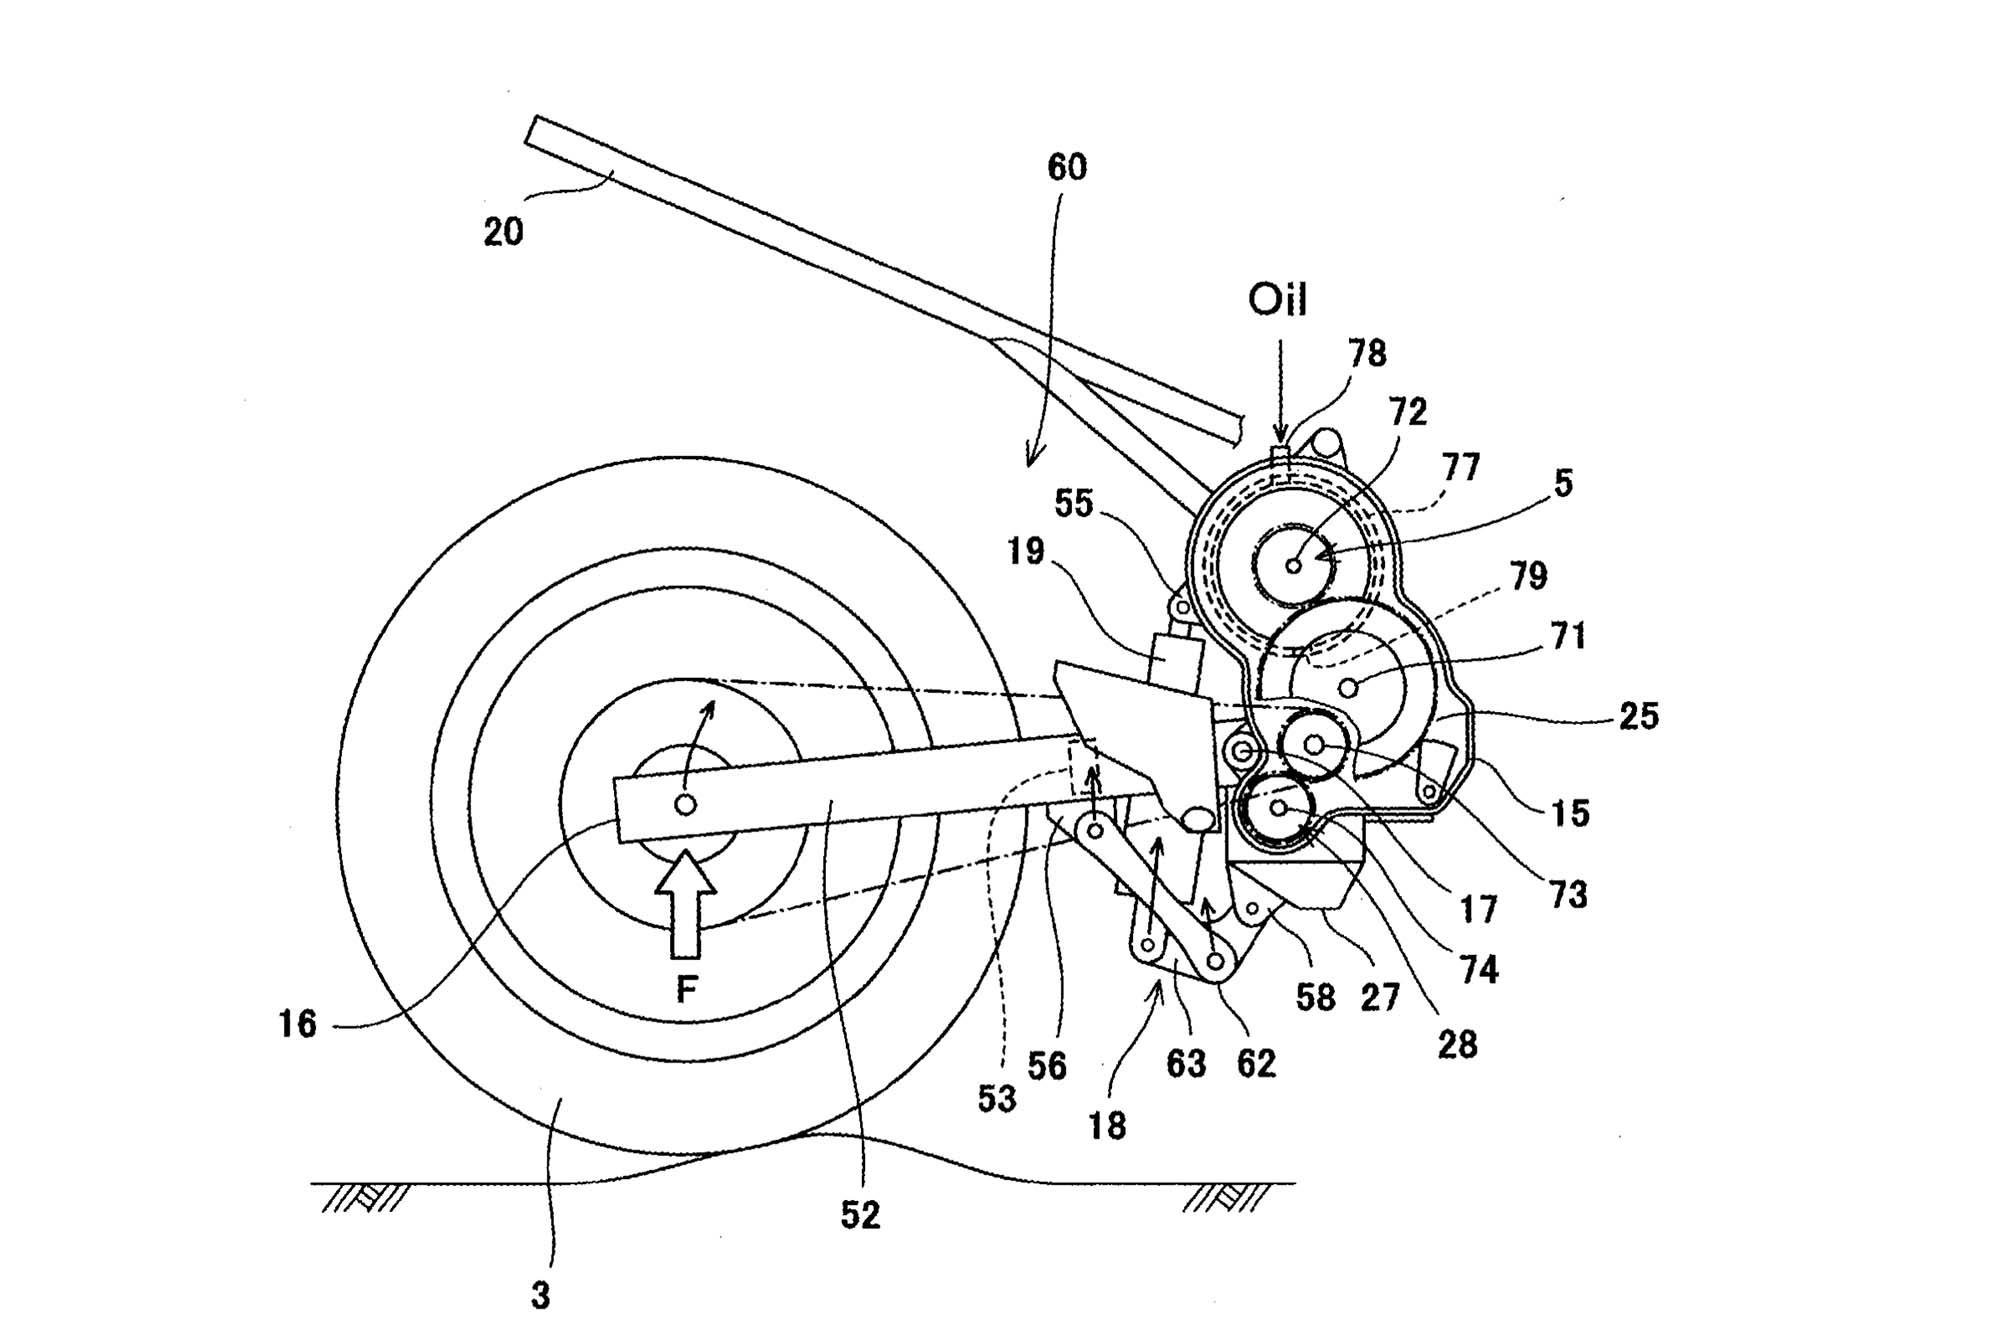 Kawasaki Applies For Electric Motorcycle Patent